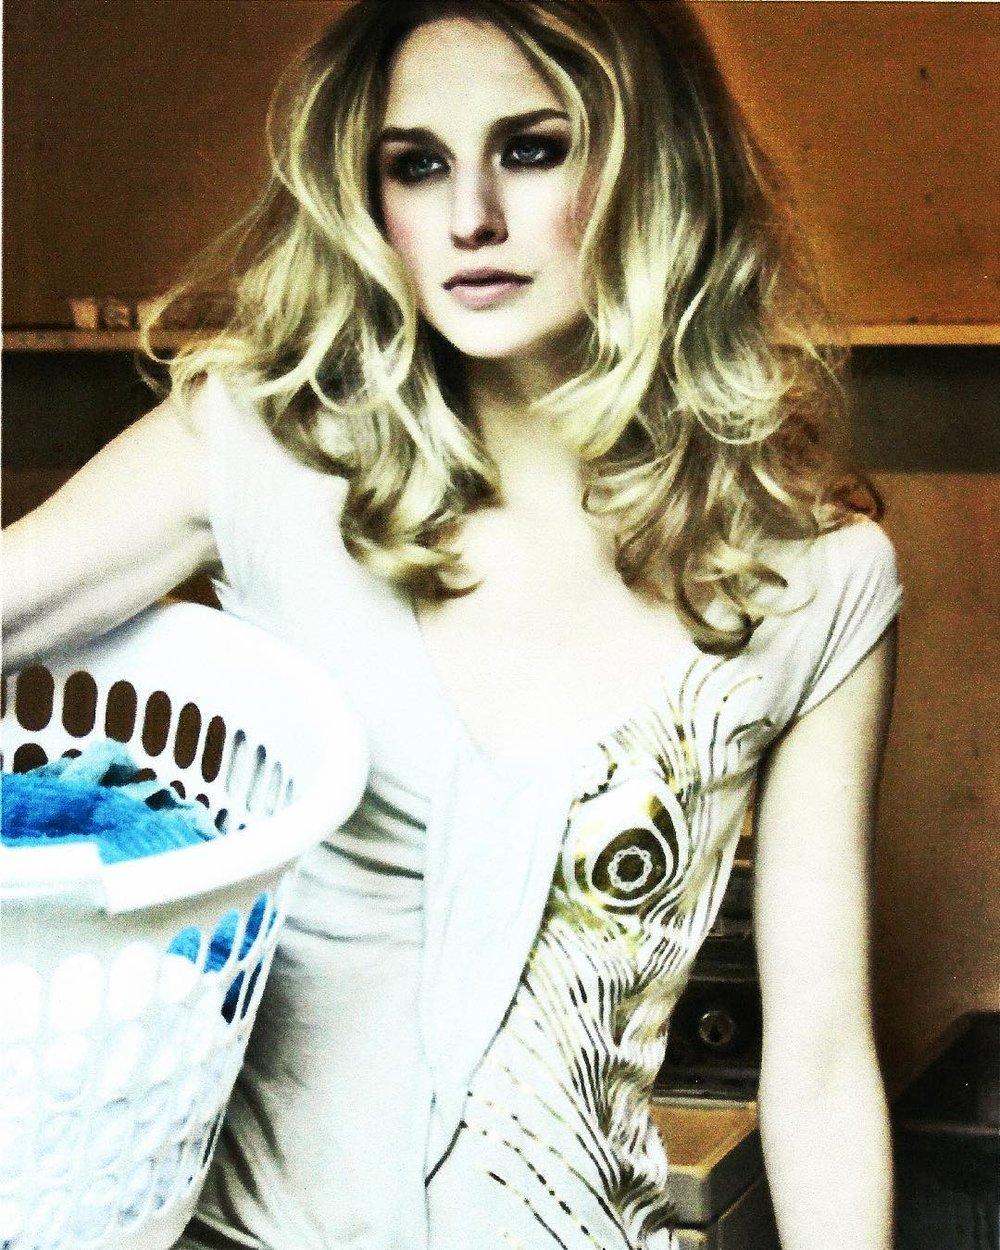 #dirtylaundry ? Not me ;) #tgif #flashbackfriday #australian #photoshoot @chadwickmodels #backintheday #model #actor #twomodelsdo